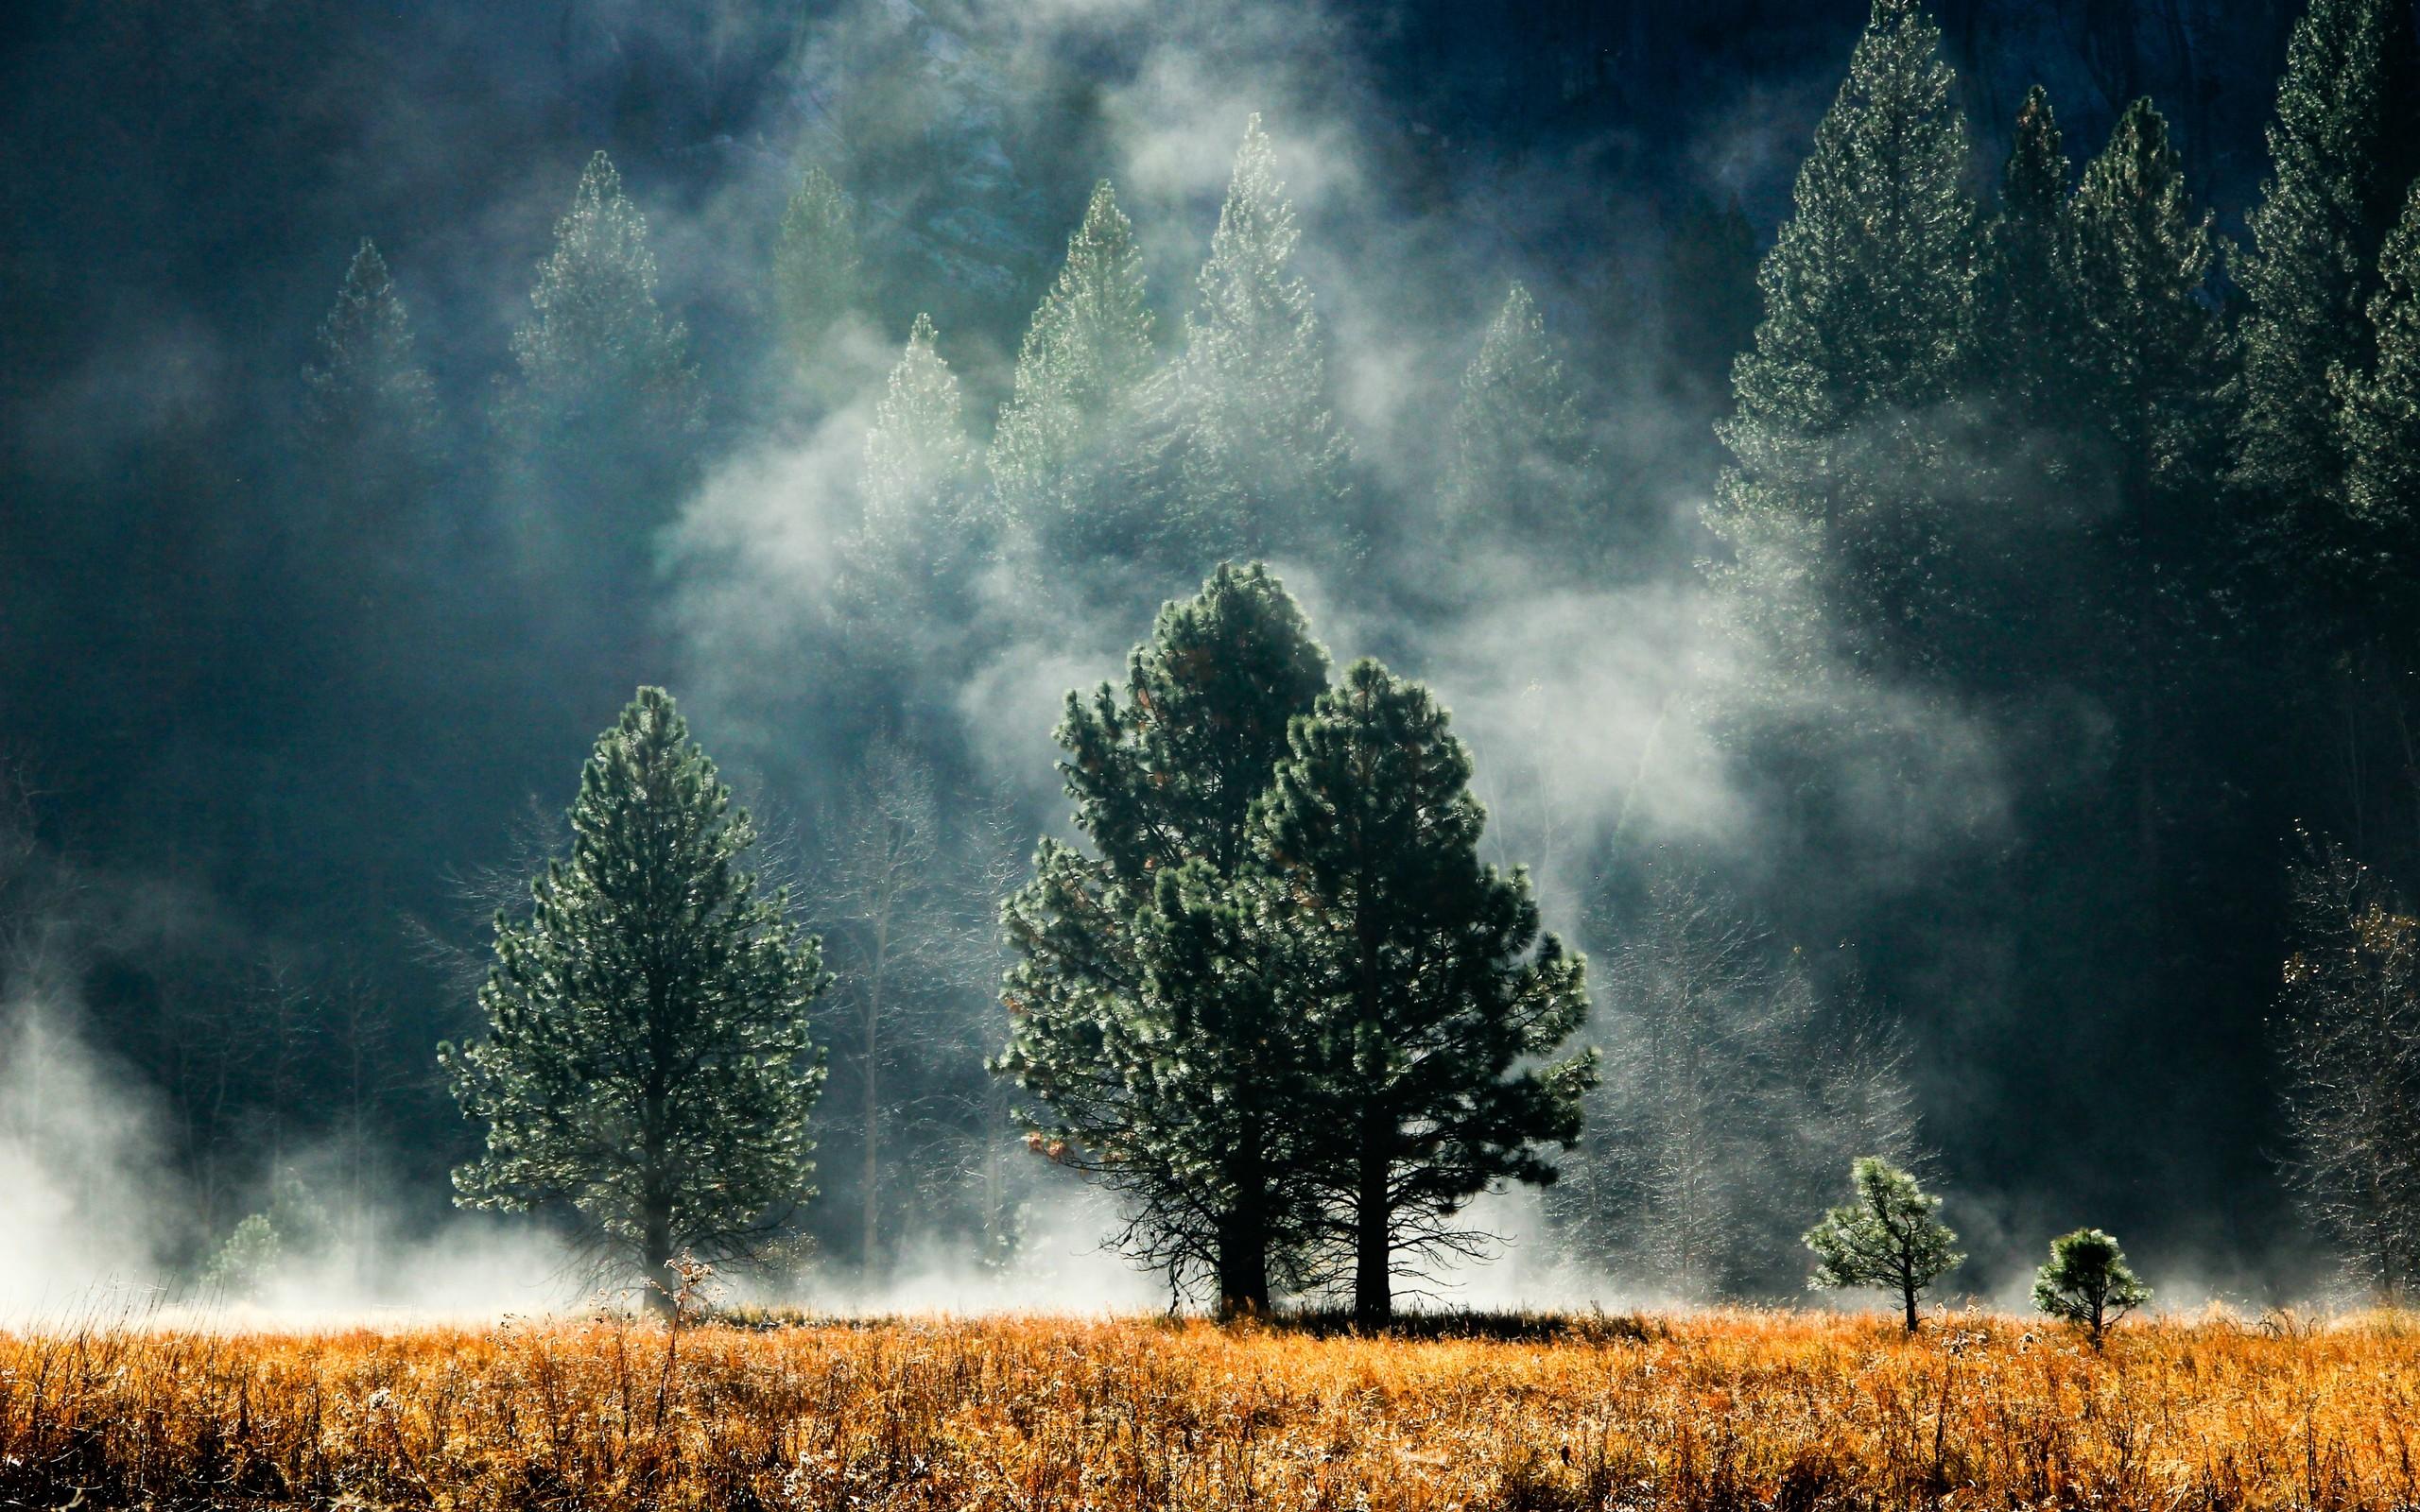 fog hd wallpaper. Â«Â«